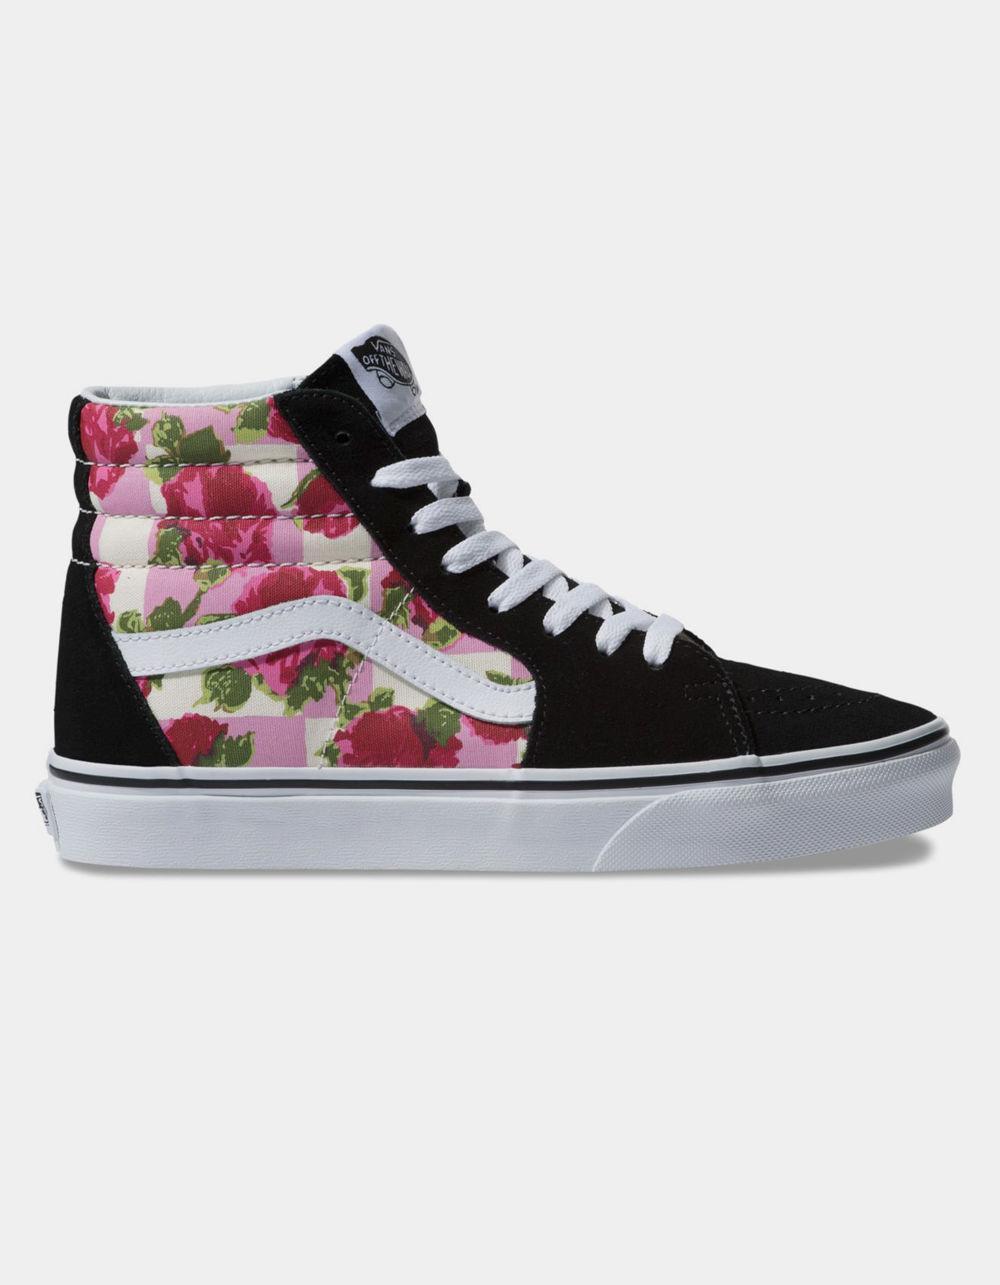 sk8 hi floral